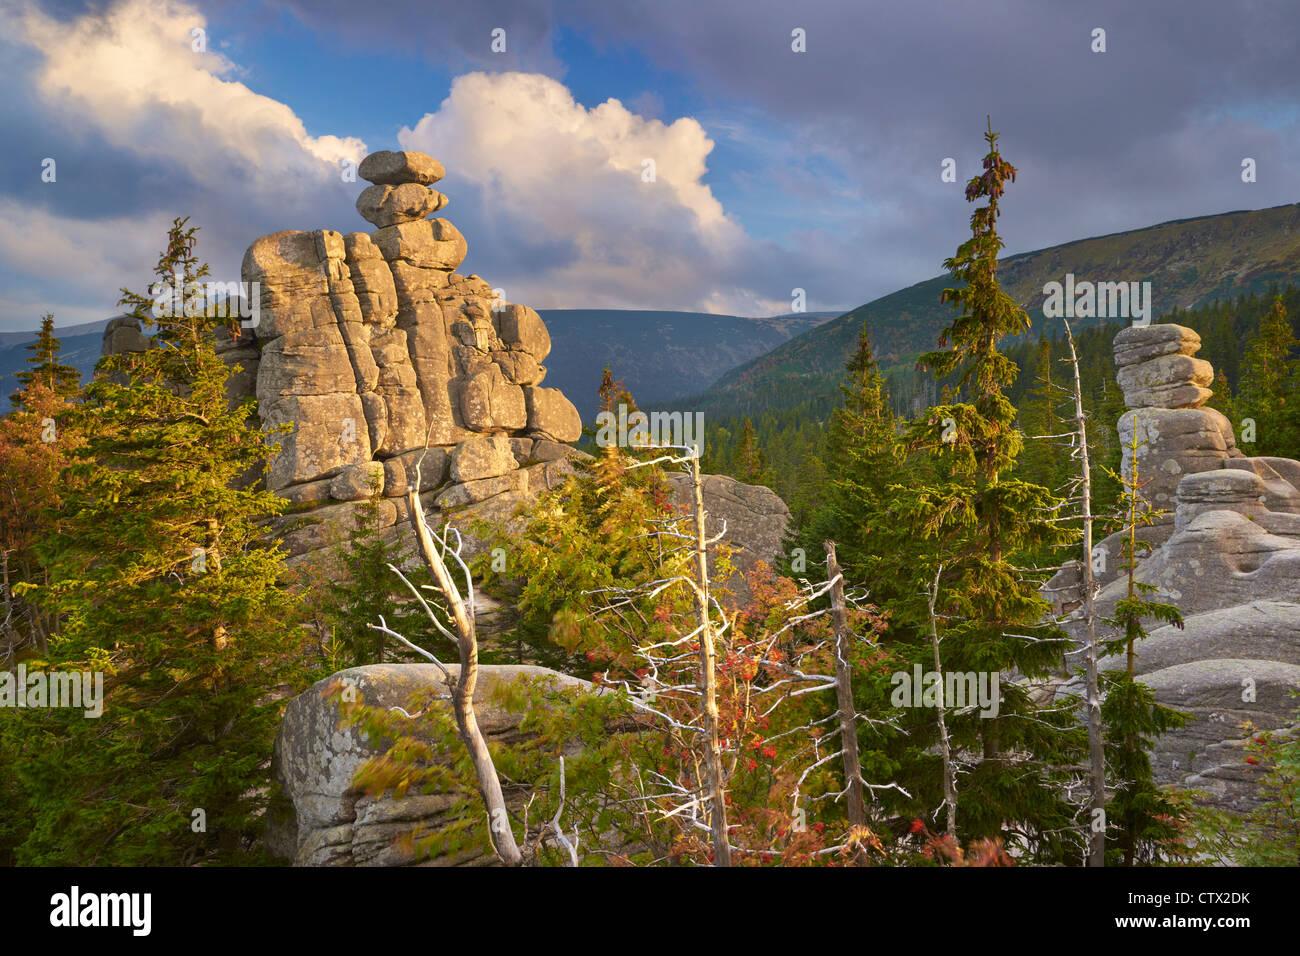 Karkonosze Mountains National Park, autumn landscape, Poland, Europe - Stock Image